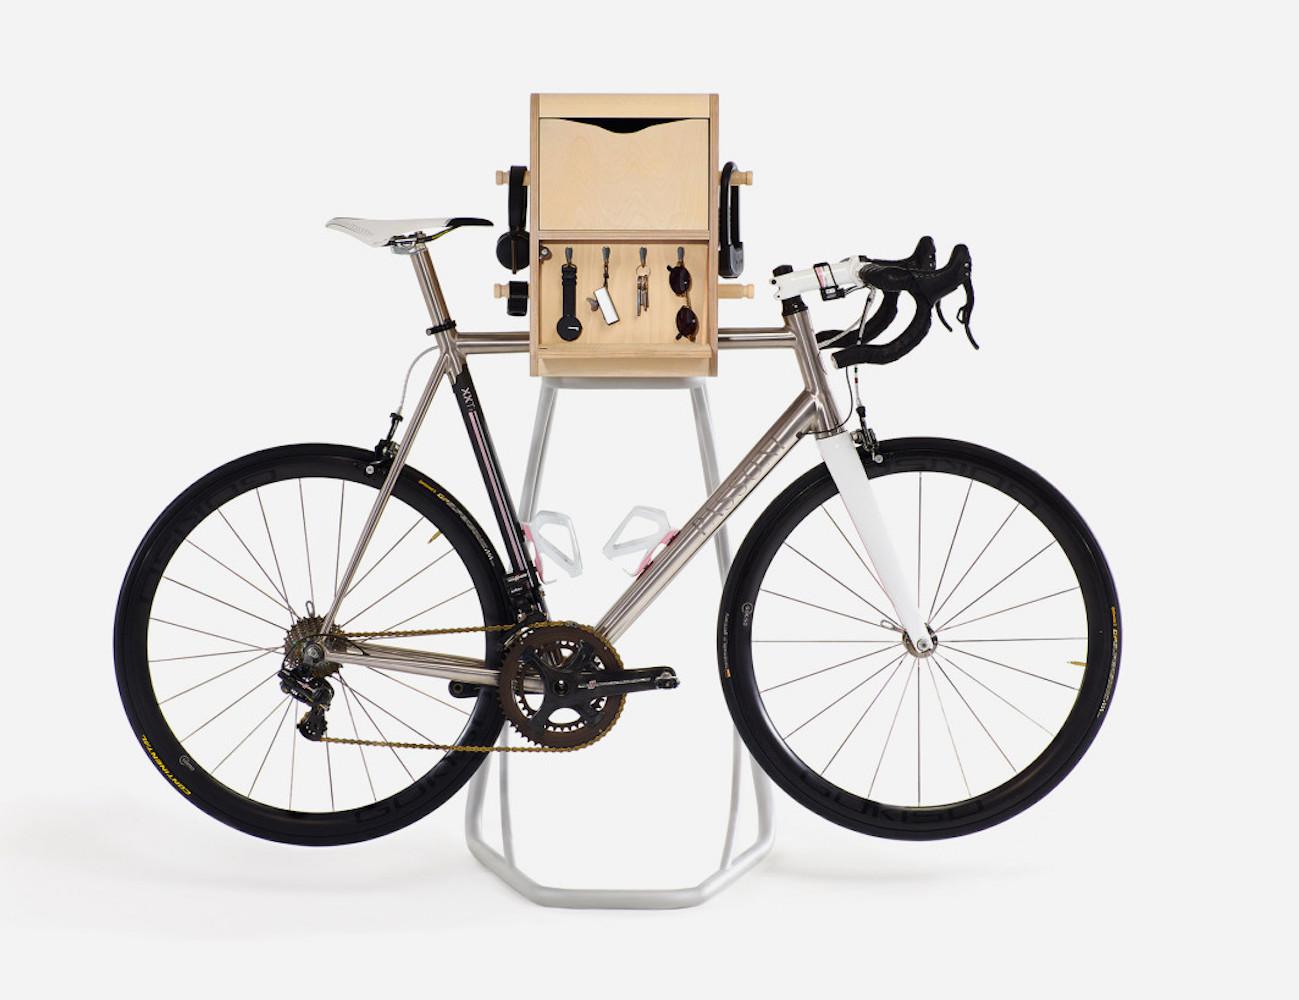 bike-butler-the-smartest-bike-stand-ever-05